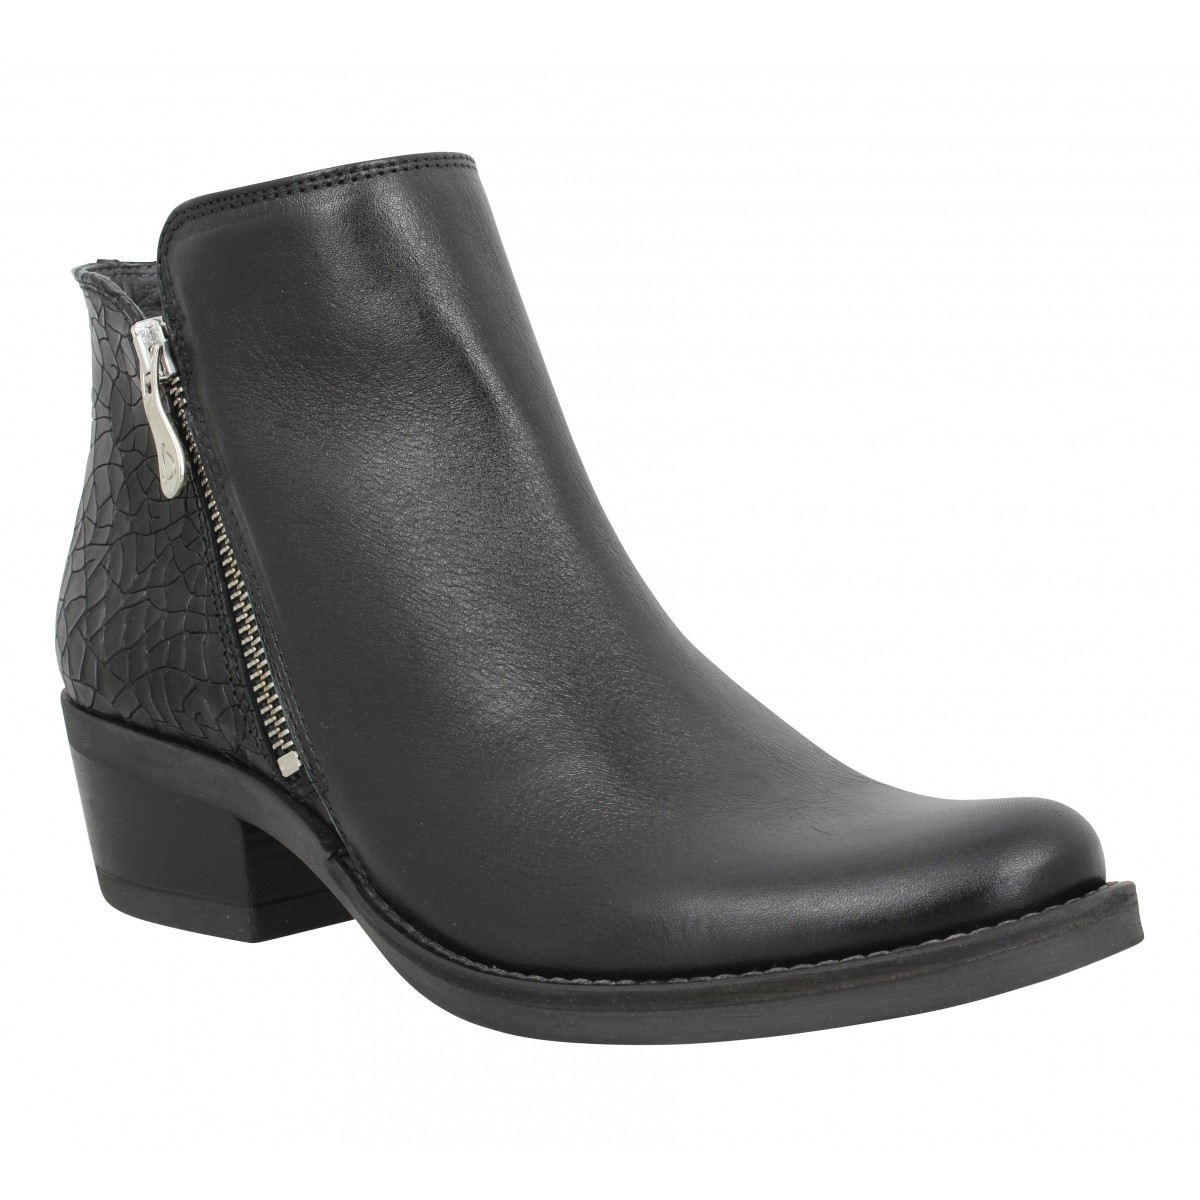 Bottines KANNA 21597 cuir Femme Noir